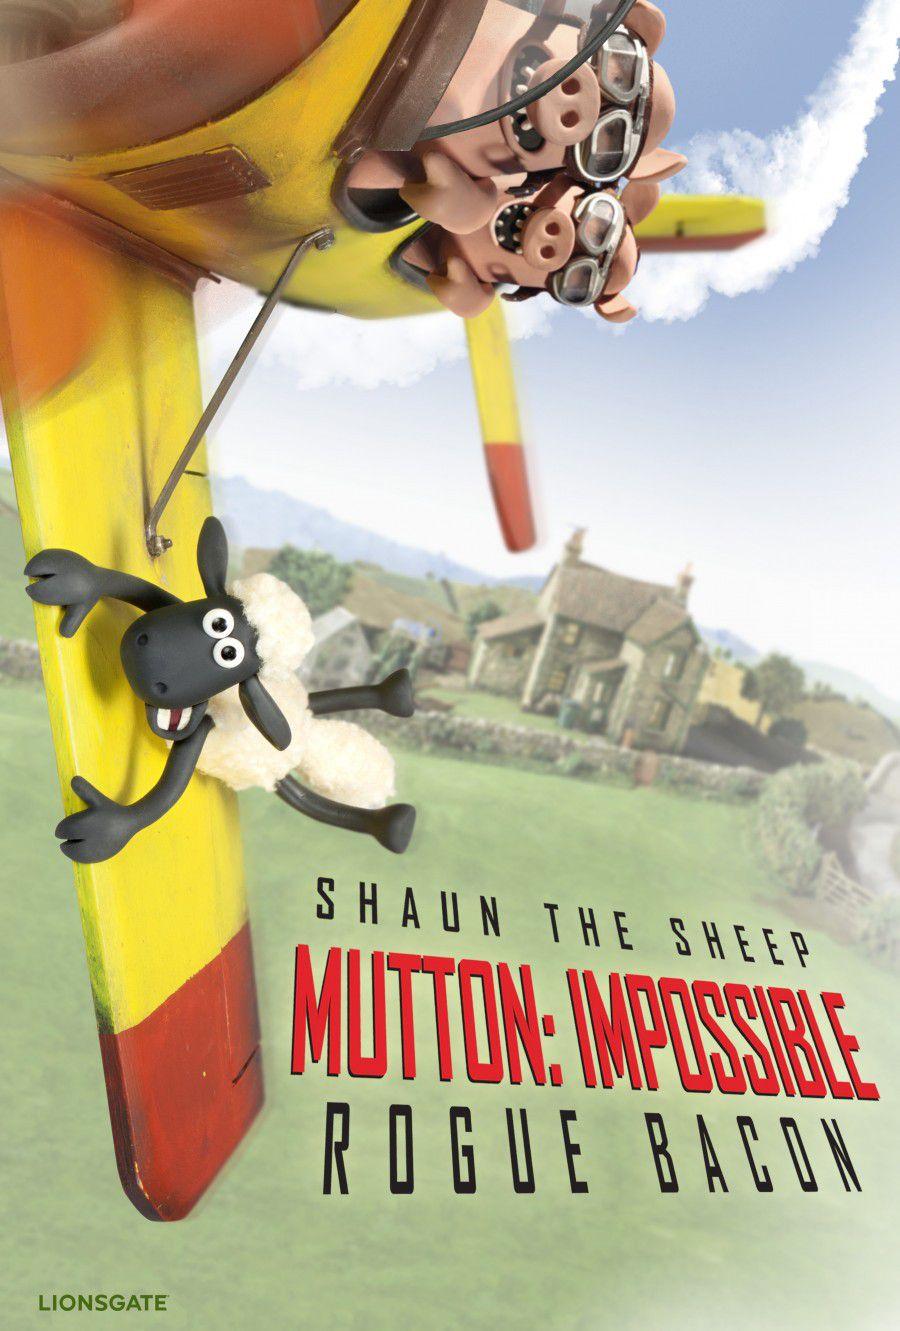 Shaun the Sheep parody poster 2